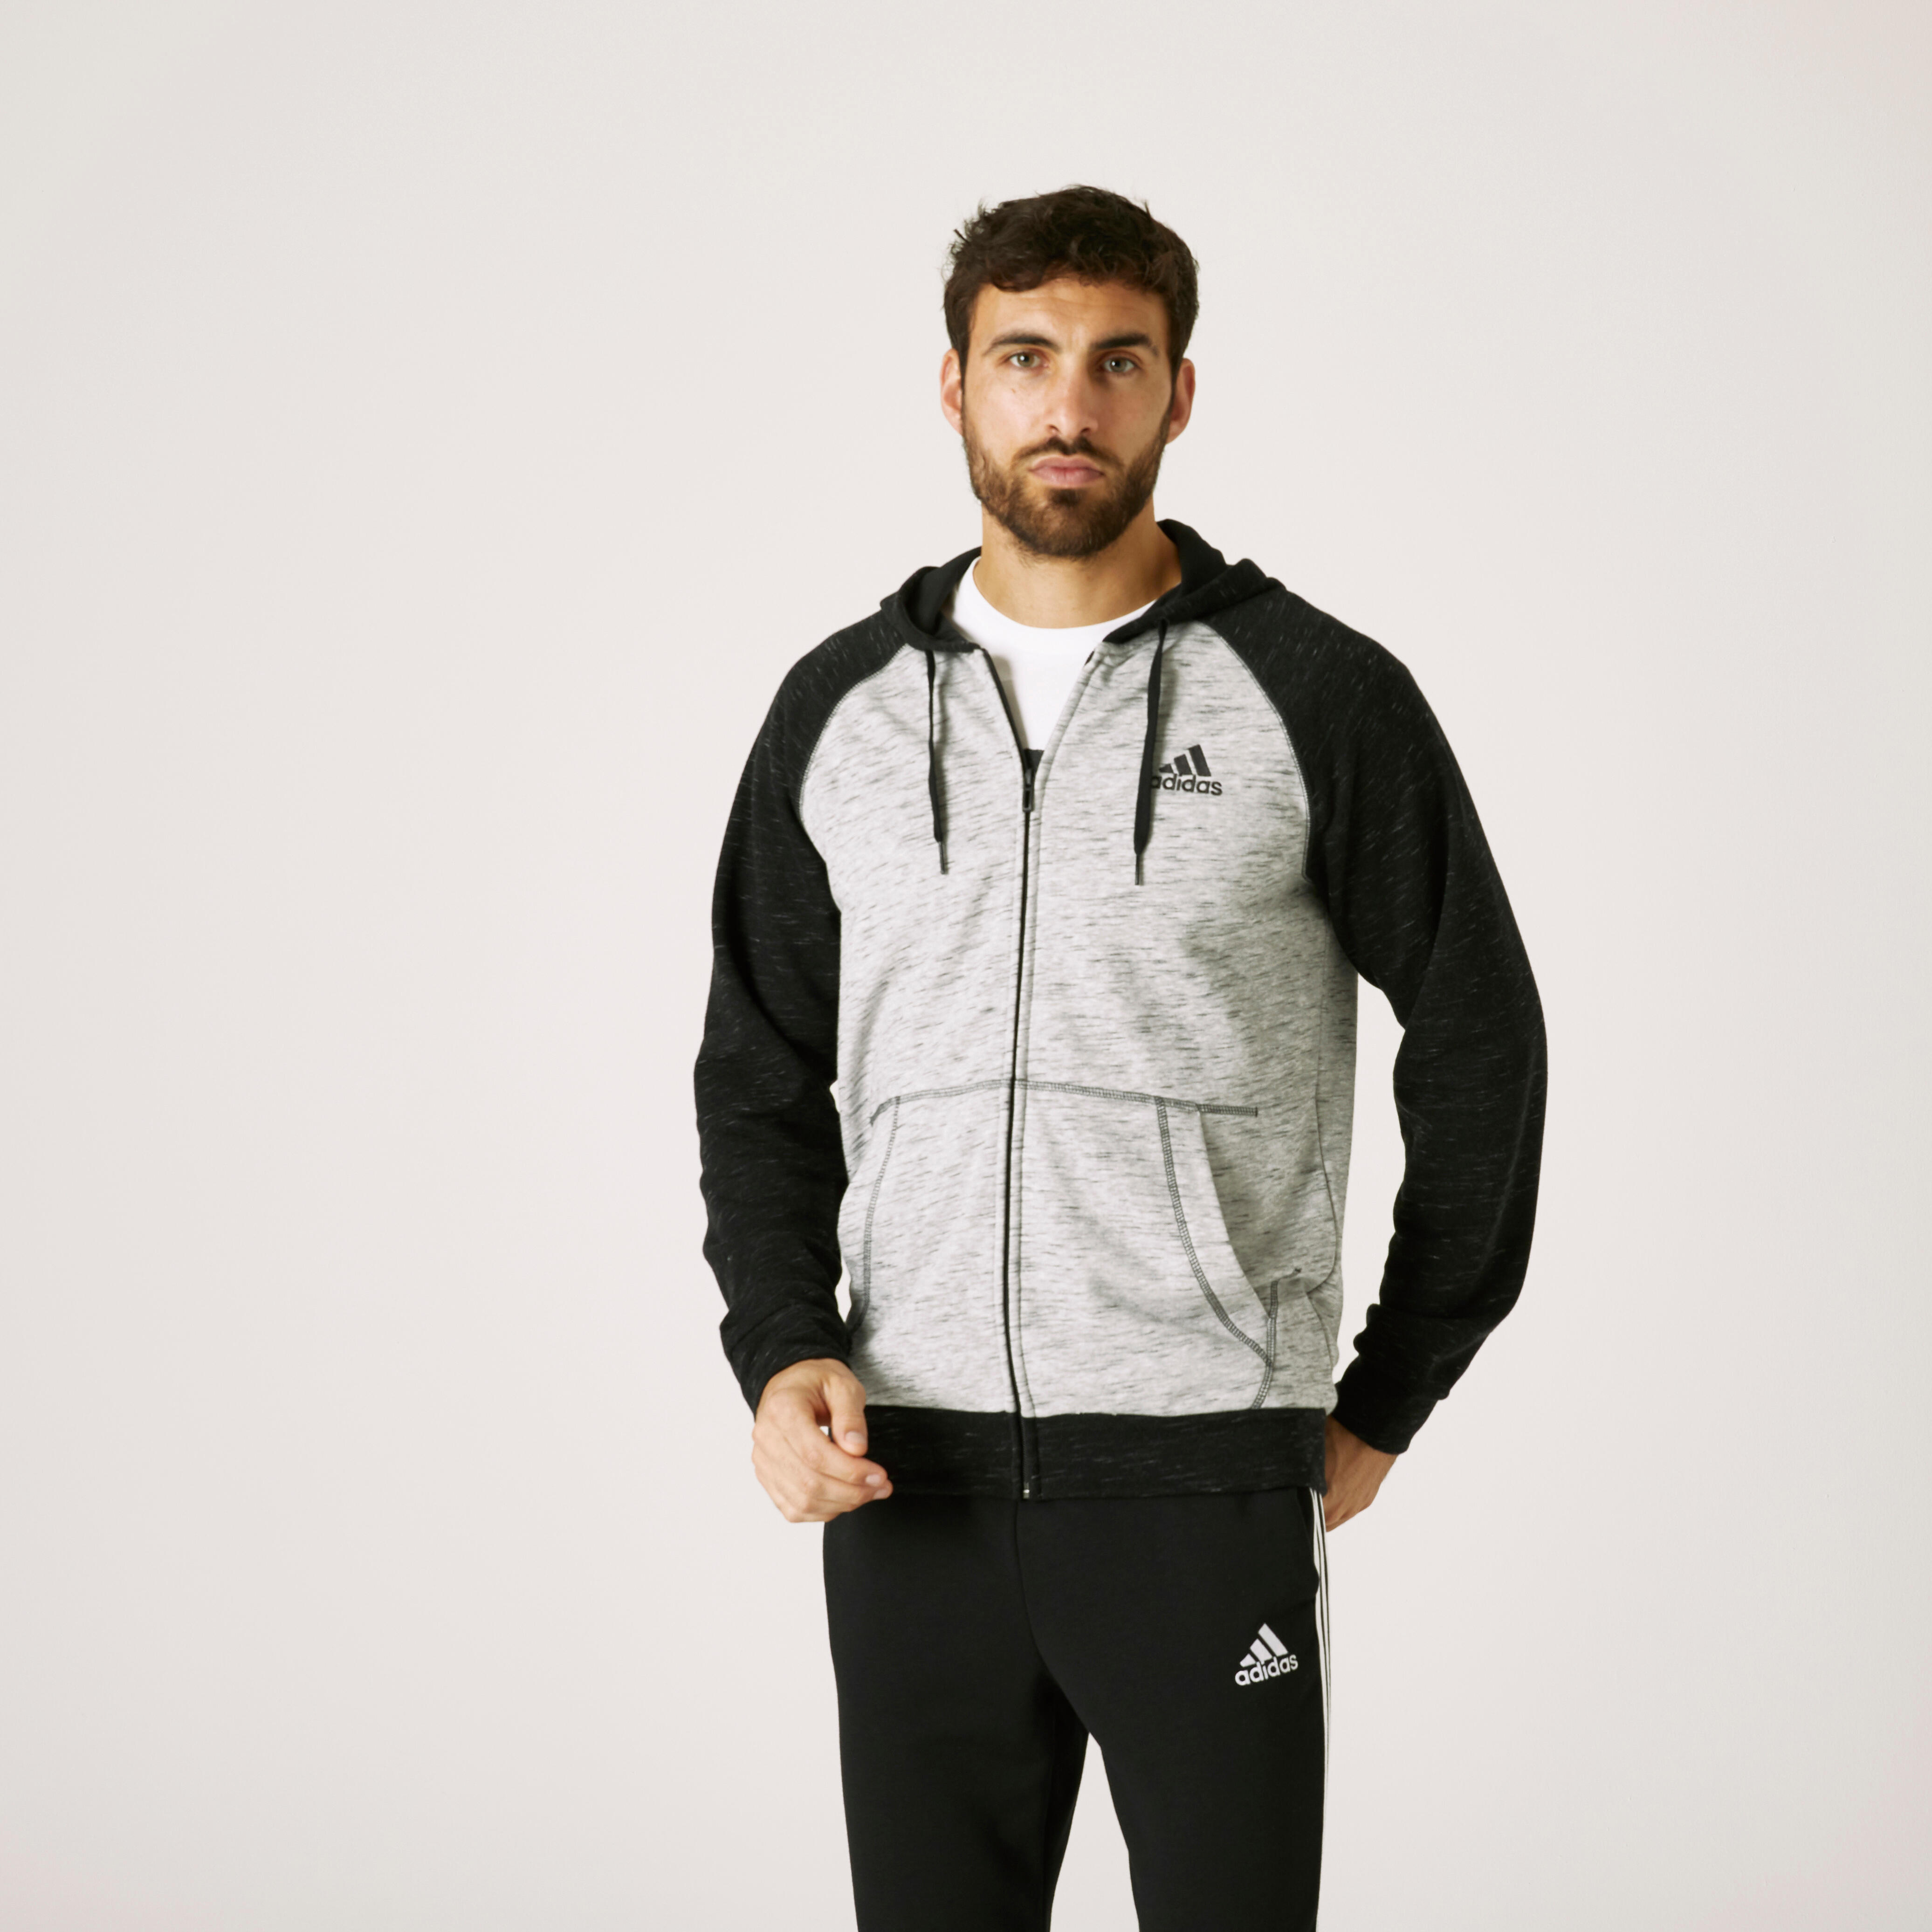 Hanorac Adidas Negru Bărbați imagine